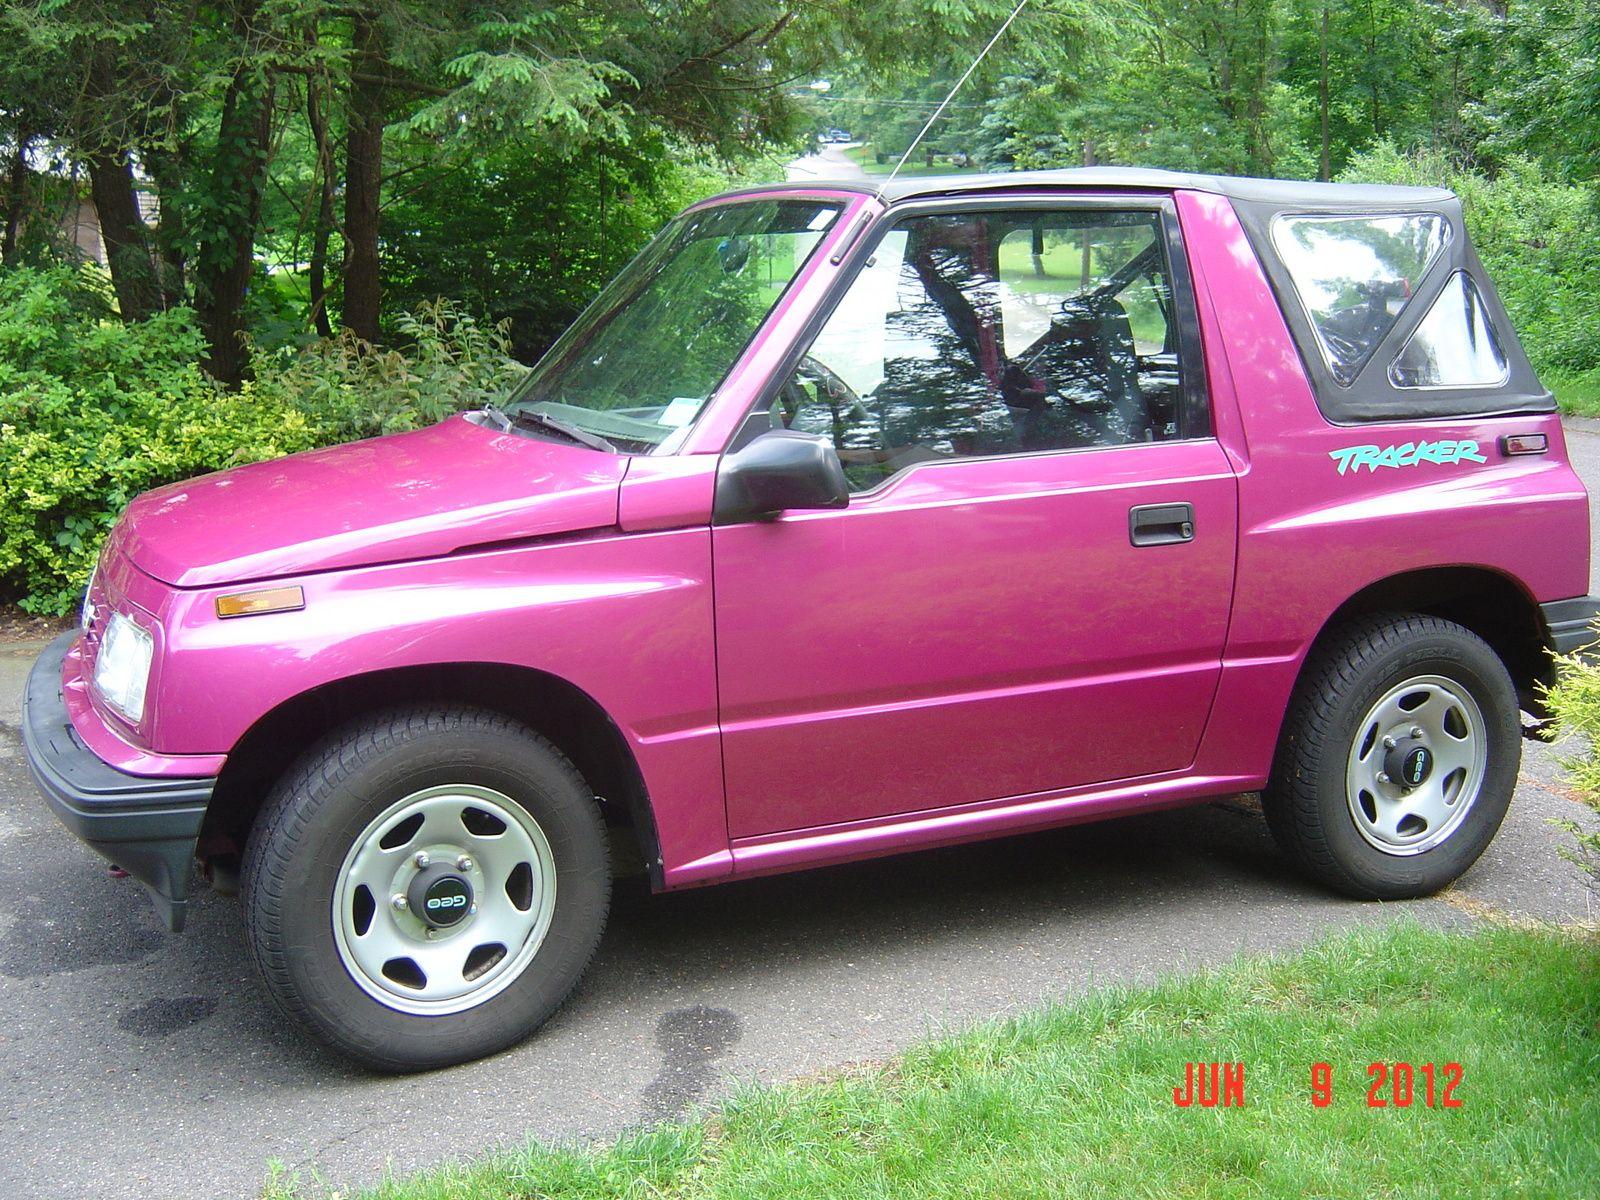 1994 Geo Tracker Pictures Cargurus Tracker Pink Truck Geo